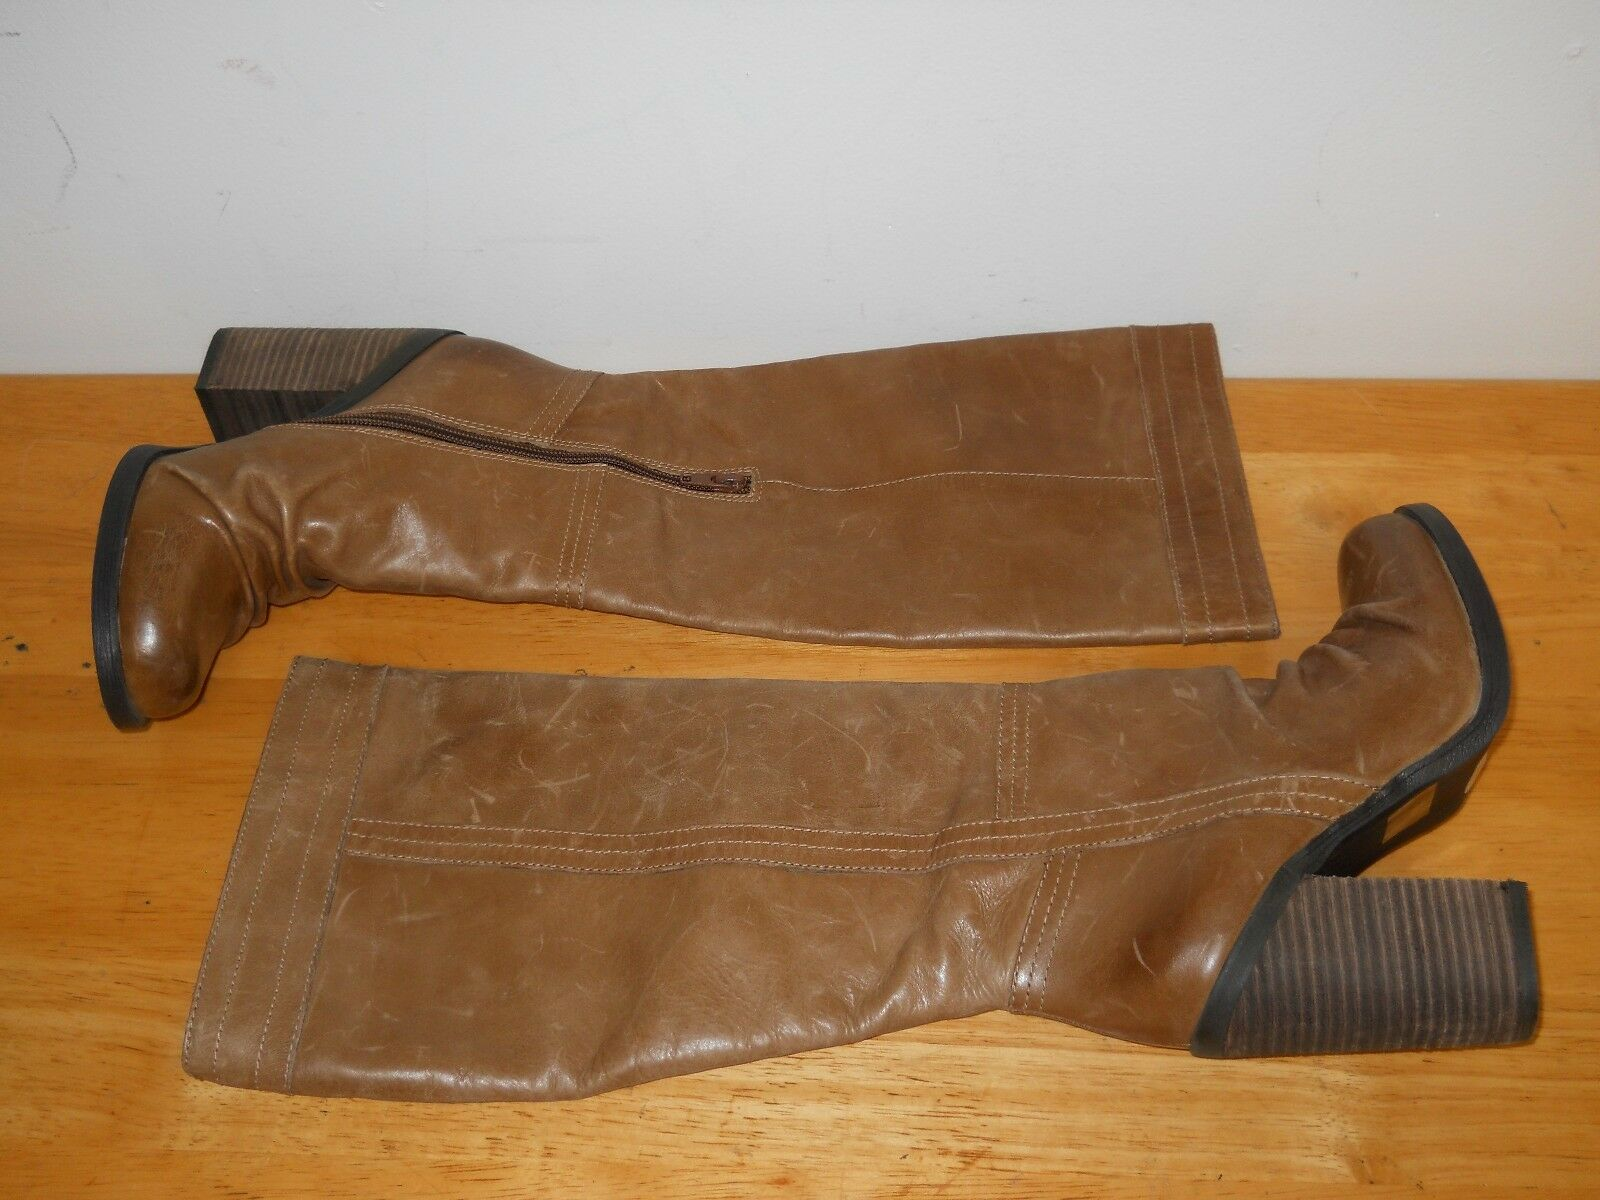 Jessica Simpson  Damenschuhe Tustiny Braun Leder Heel Stiefel 5.5 M Schuhes Distressed